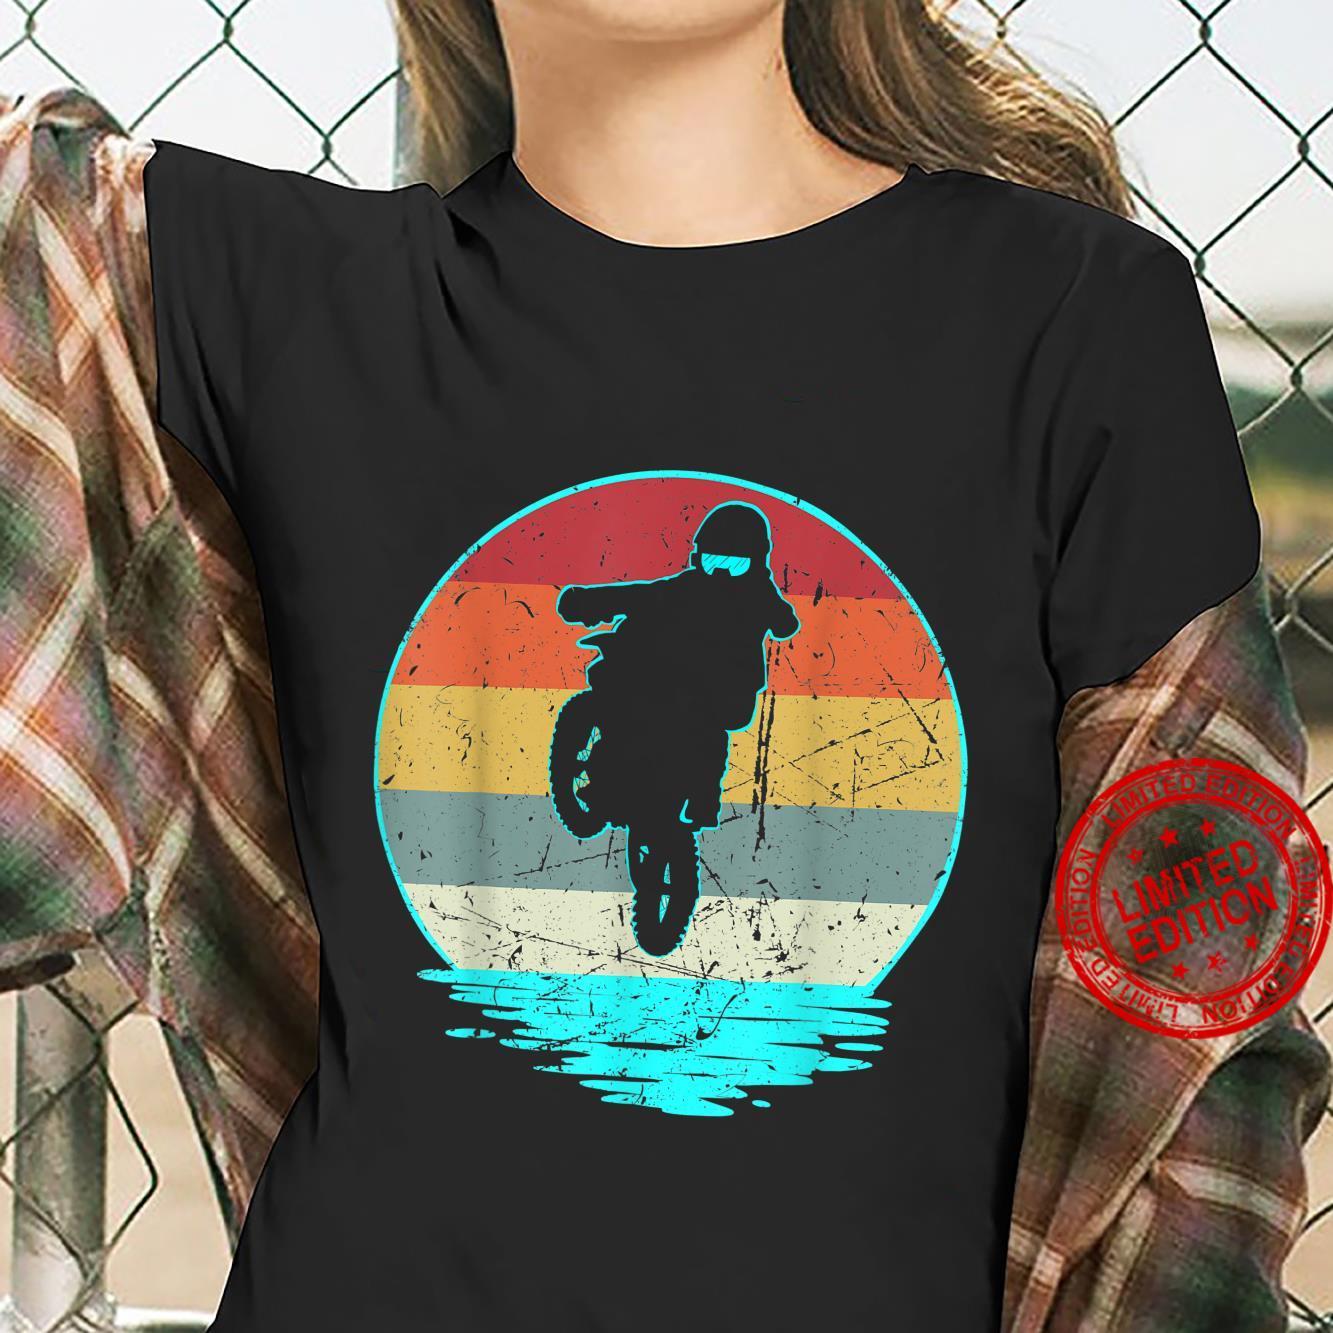 Dirt Biking Shirt Dirt Biker im VintageRetroStil Shirt ladies tee